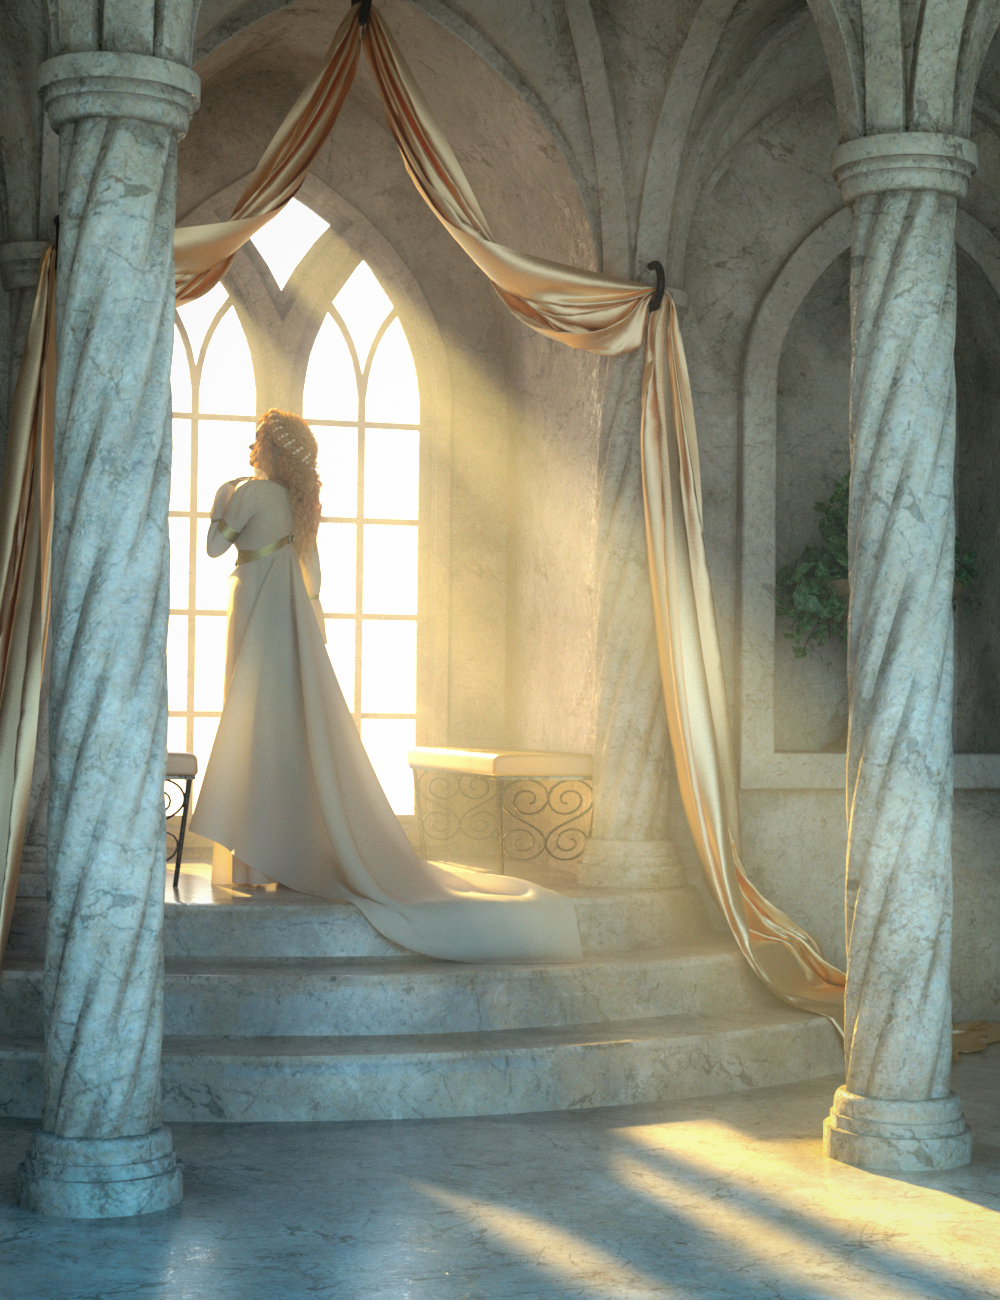 Fantasy Alcove Window by: SloshWerks, 3D Models by Daz 3D